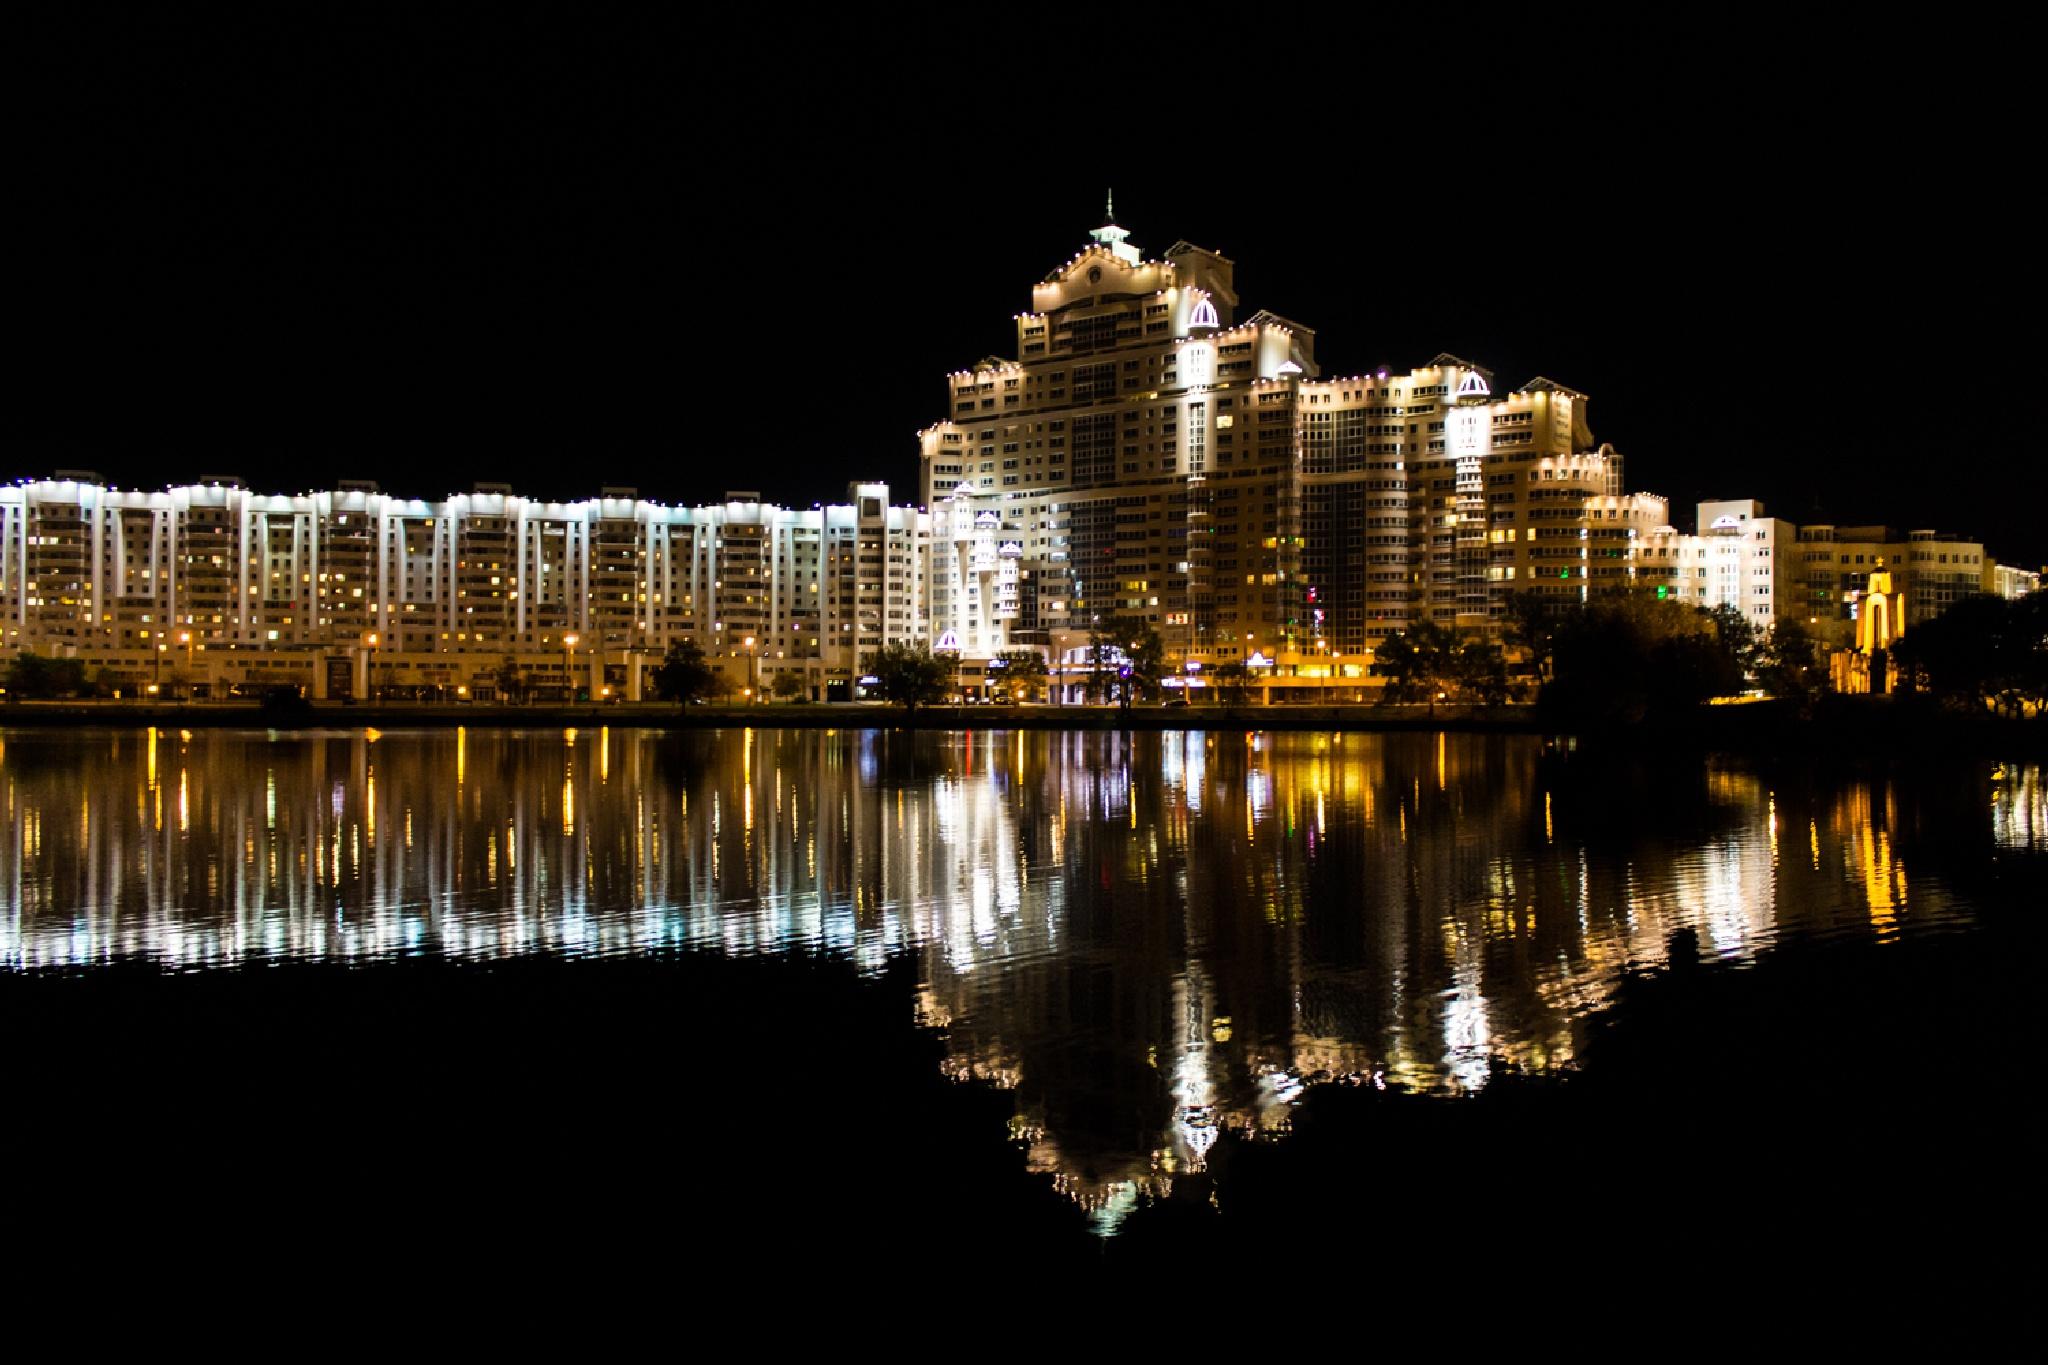 night sity by kozakovs